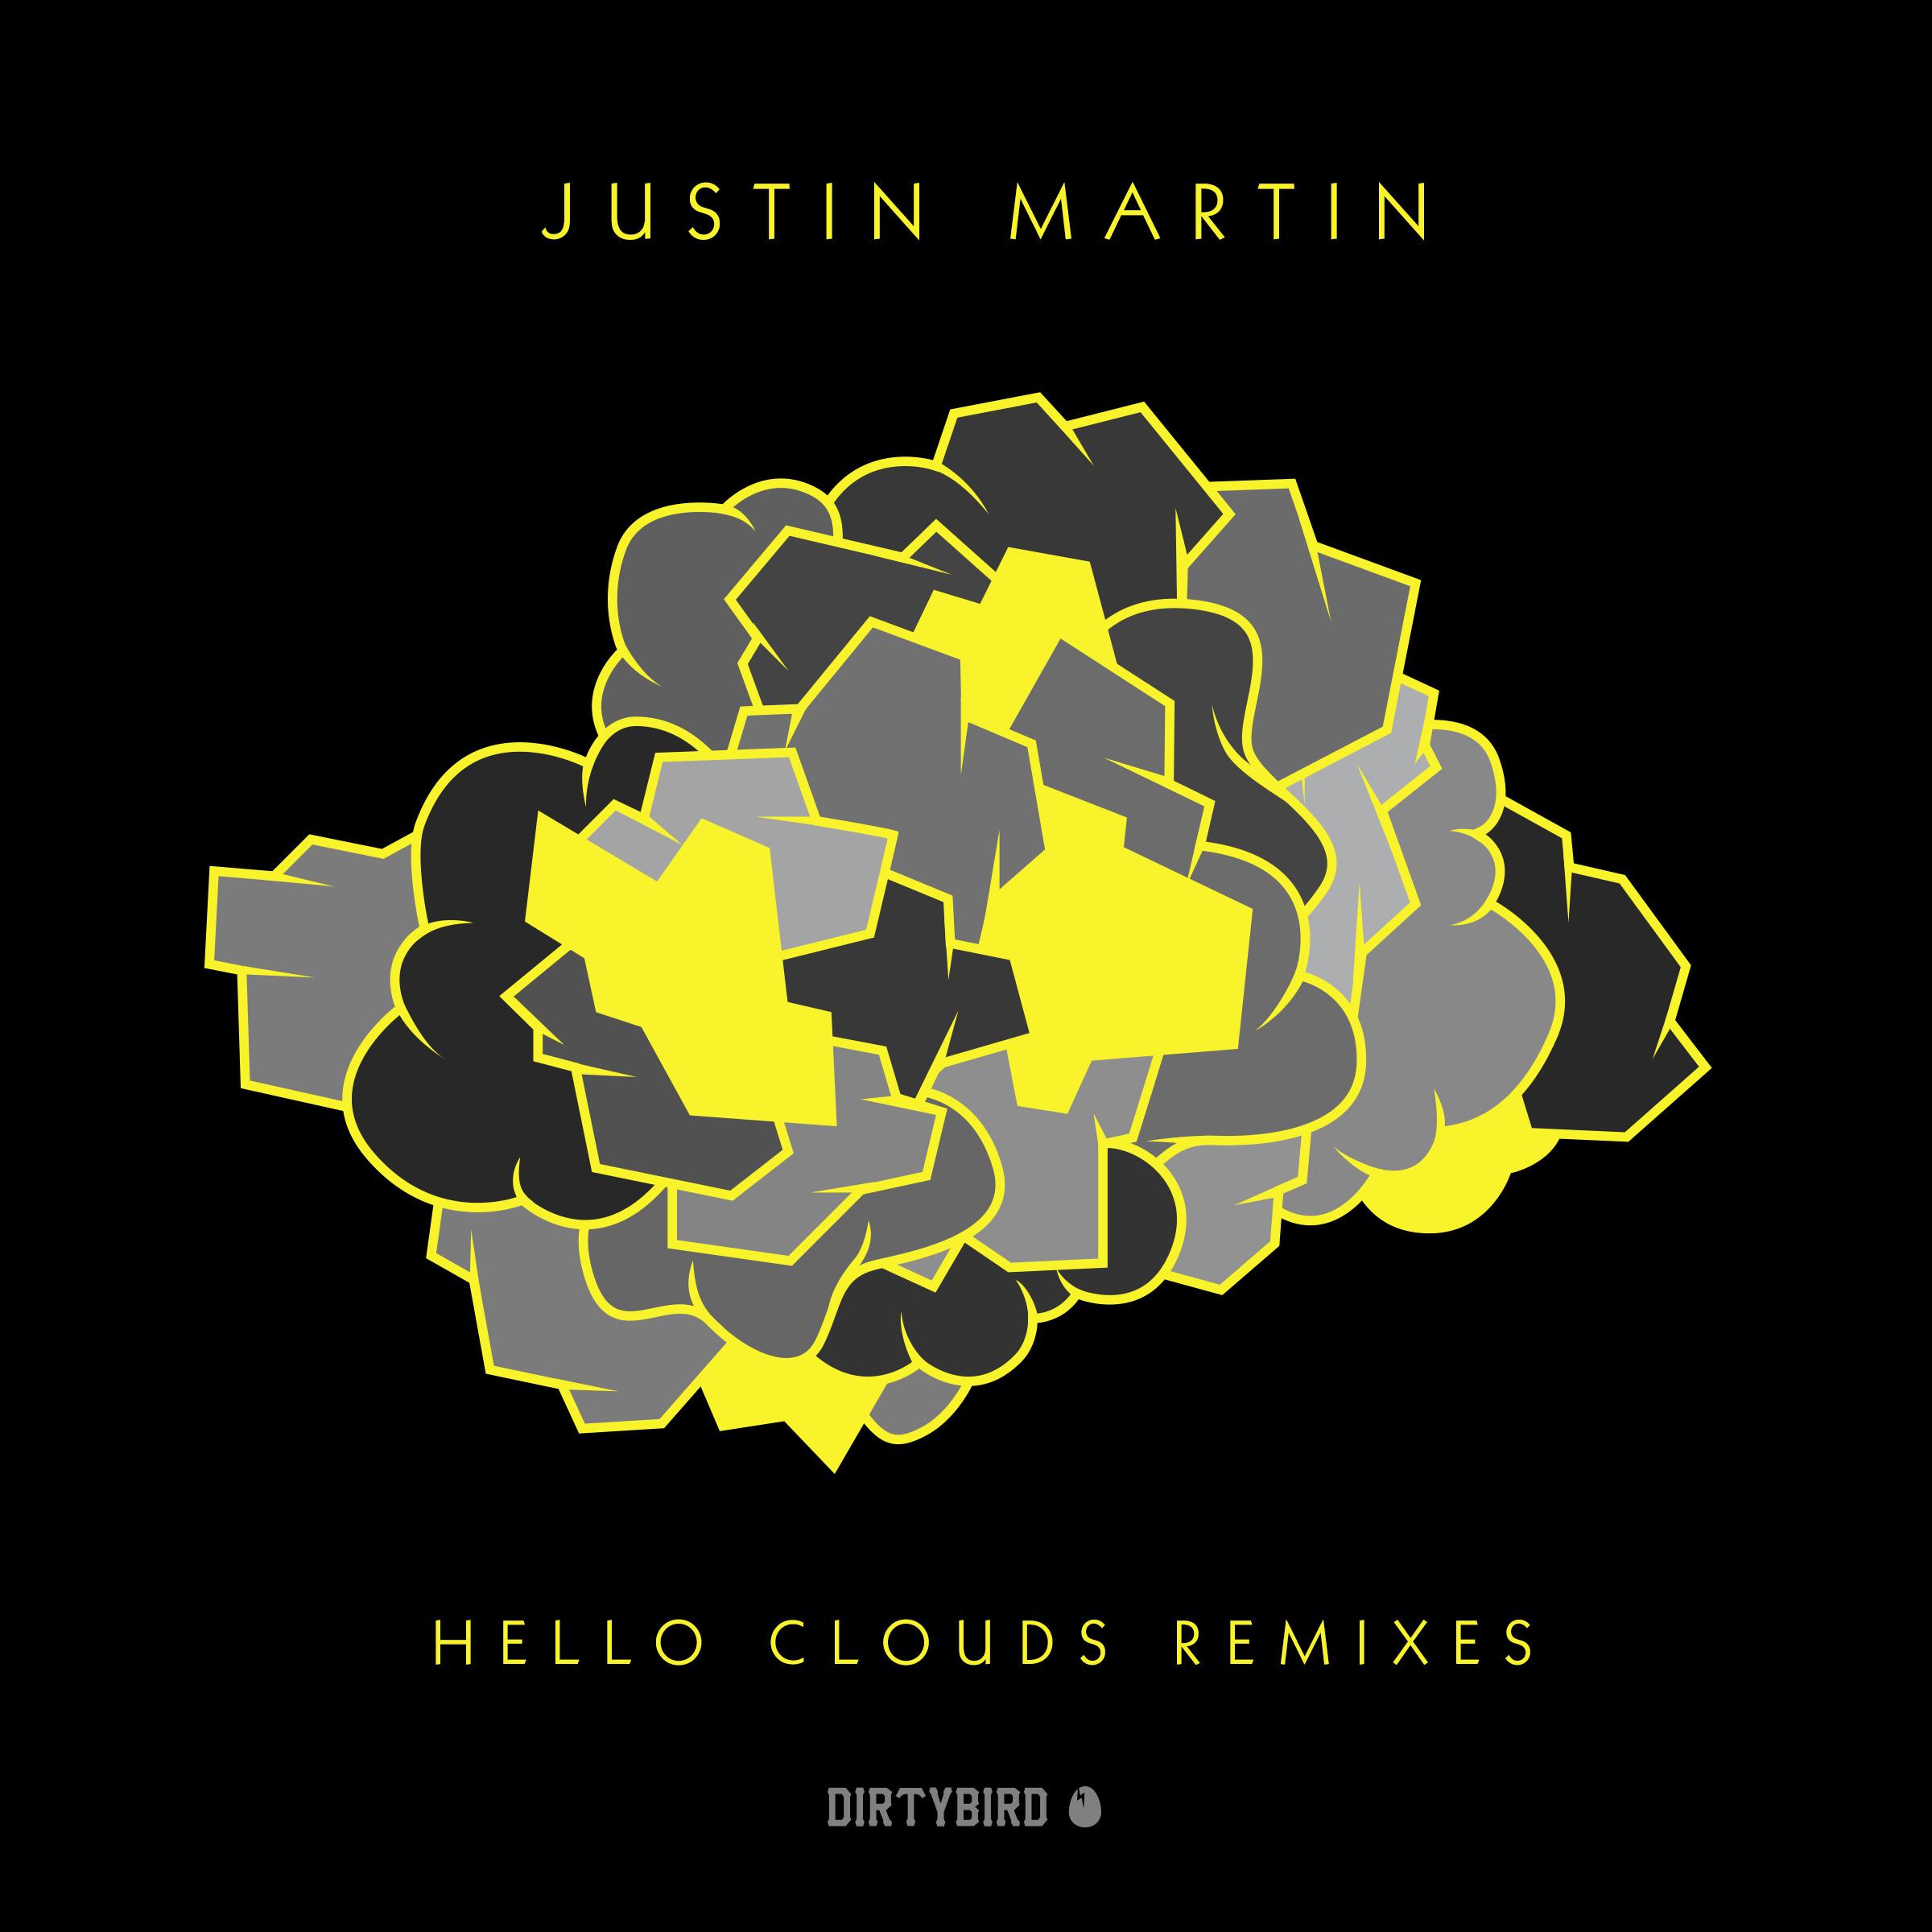 Justinmartin helloclouds remixes